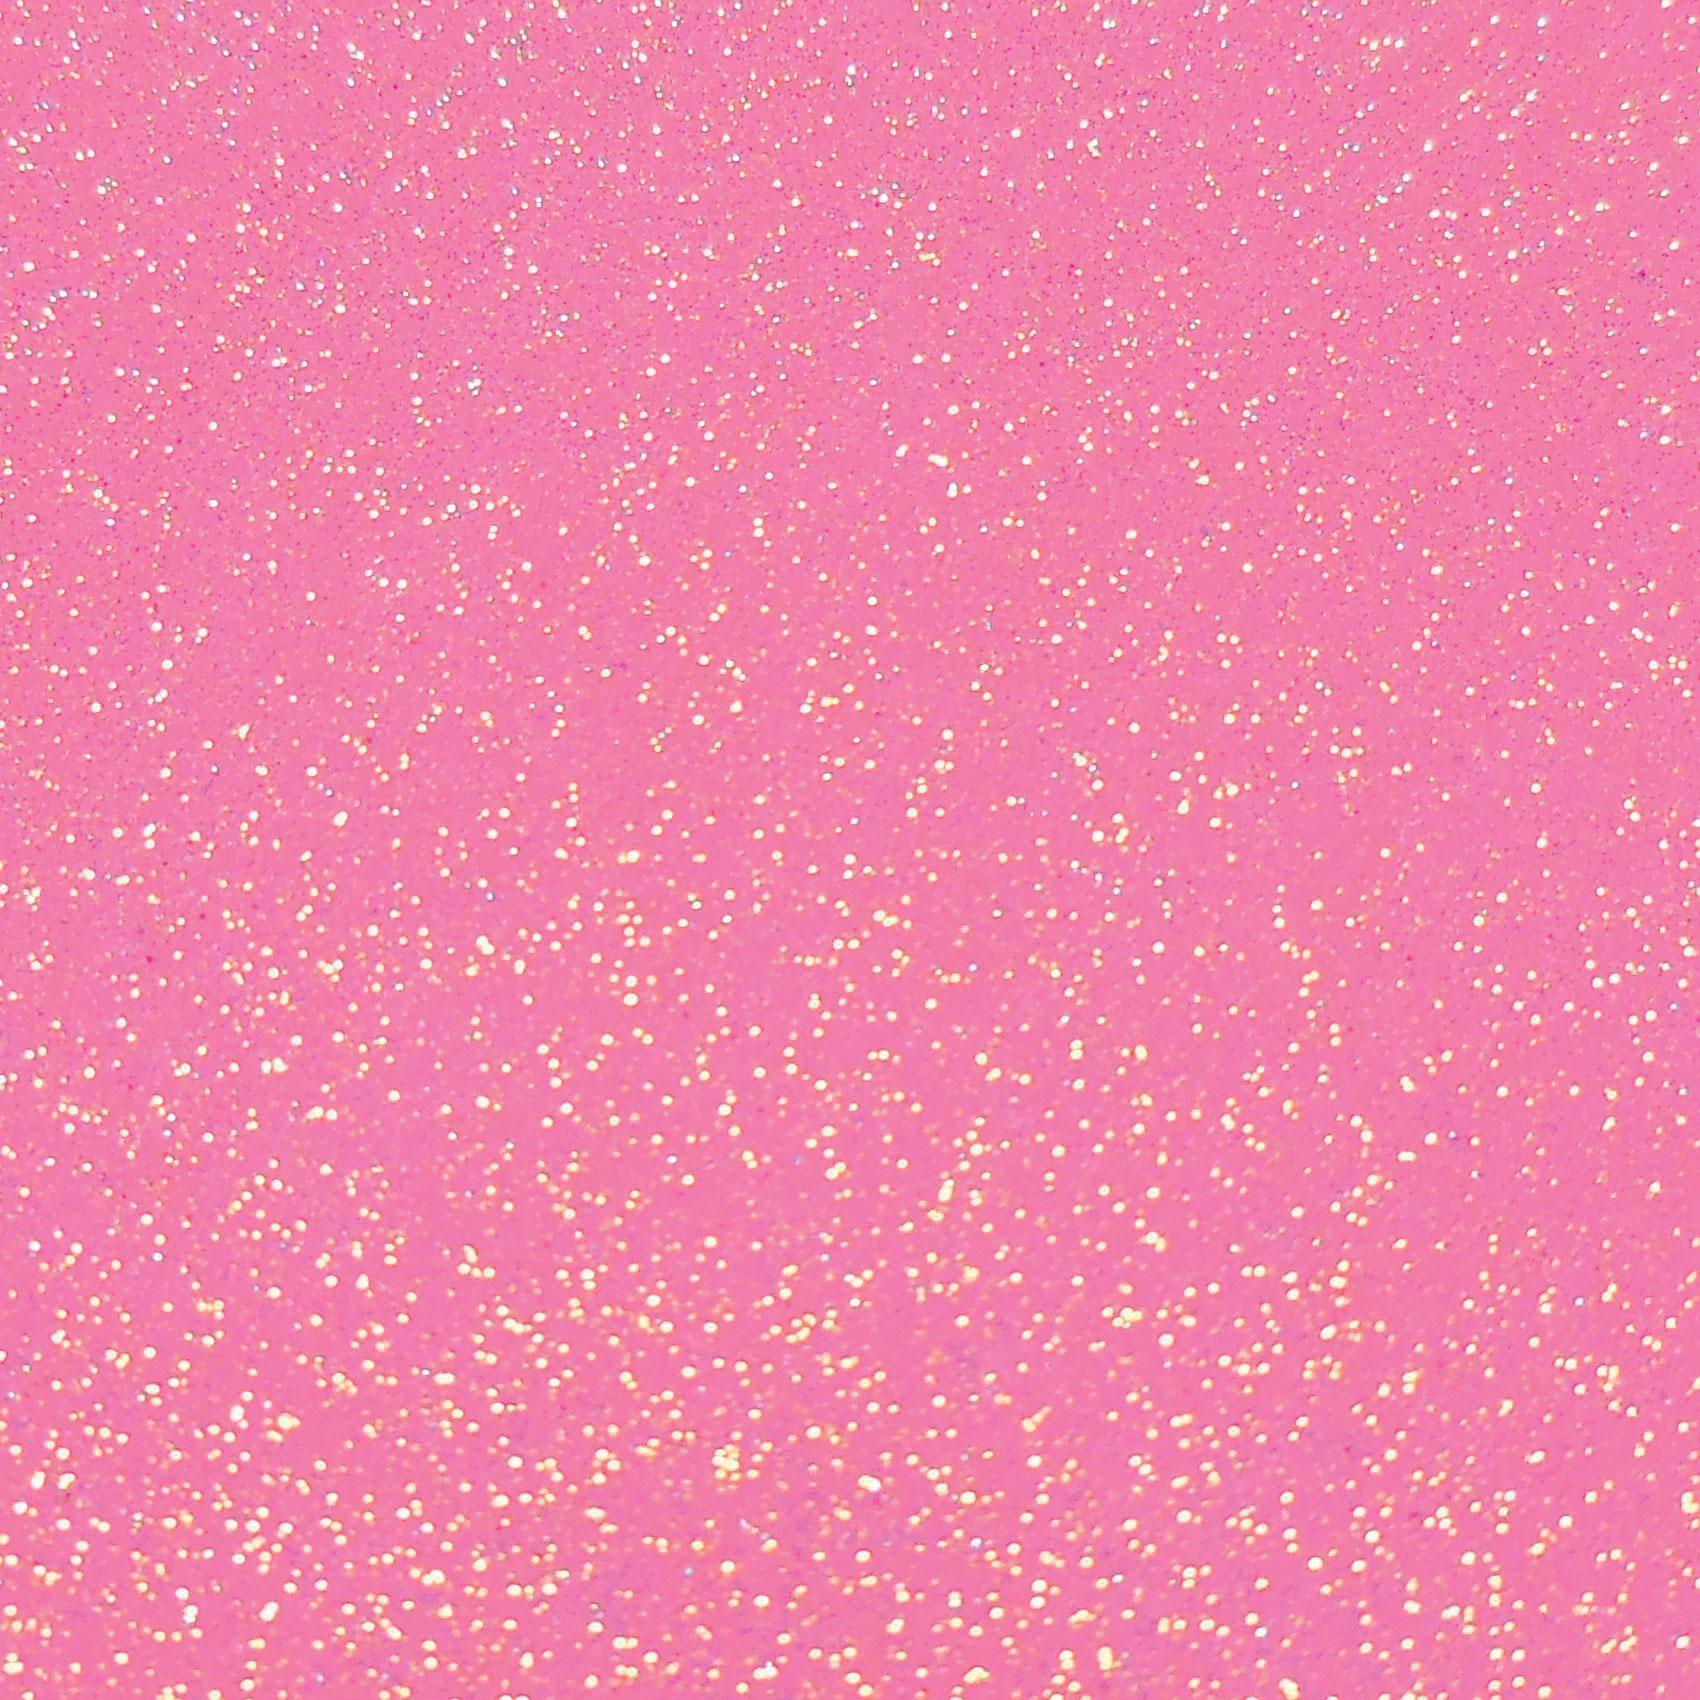 Velo glitter neon pink